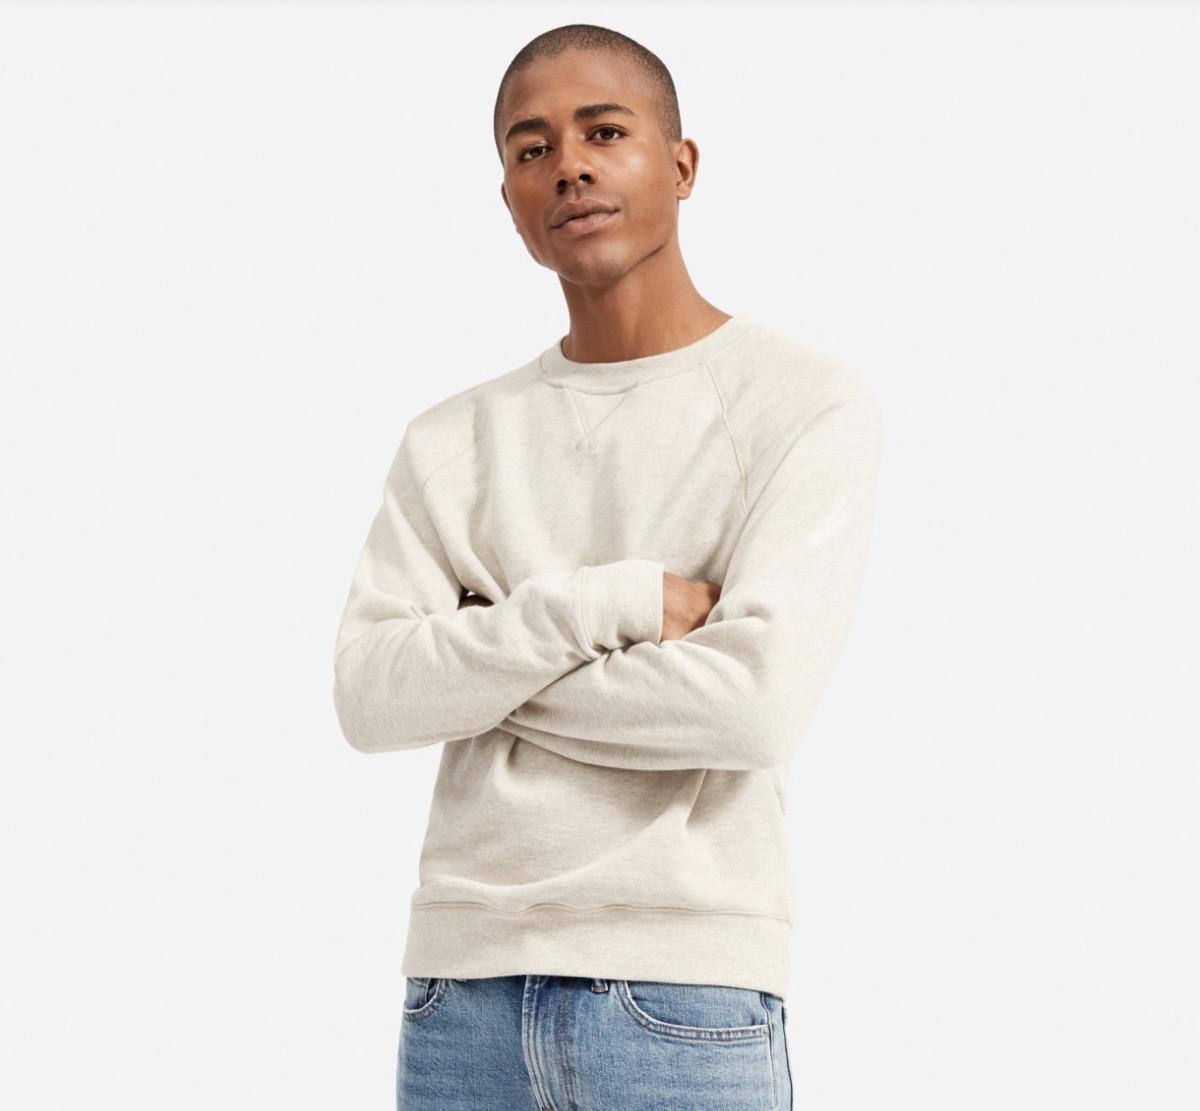 young black man in cream colored sweatshirt